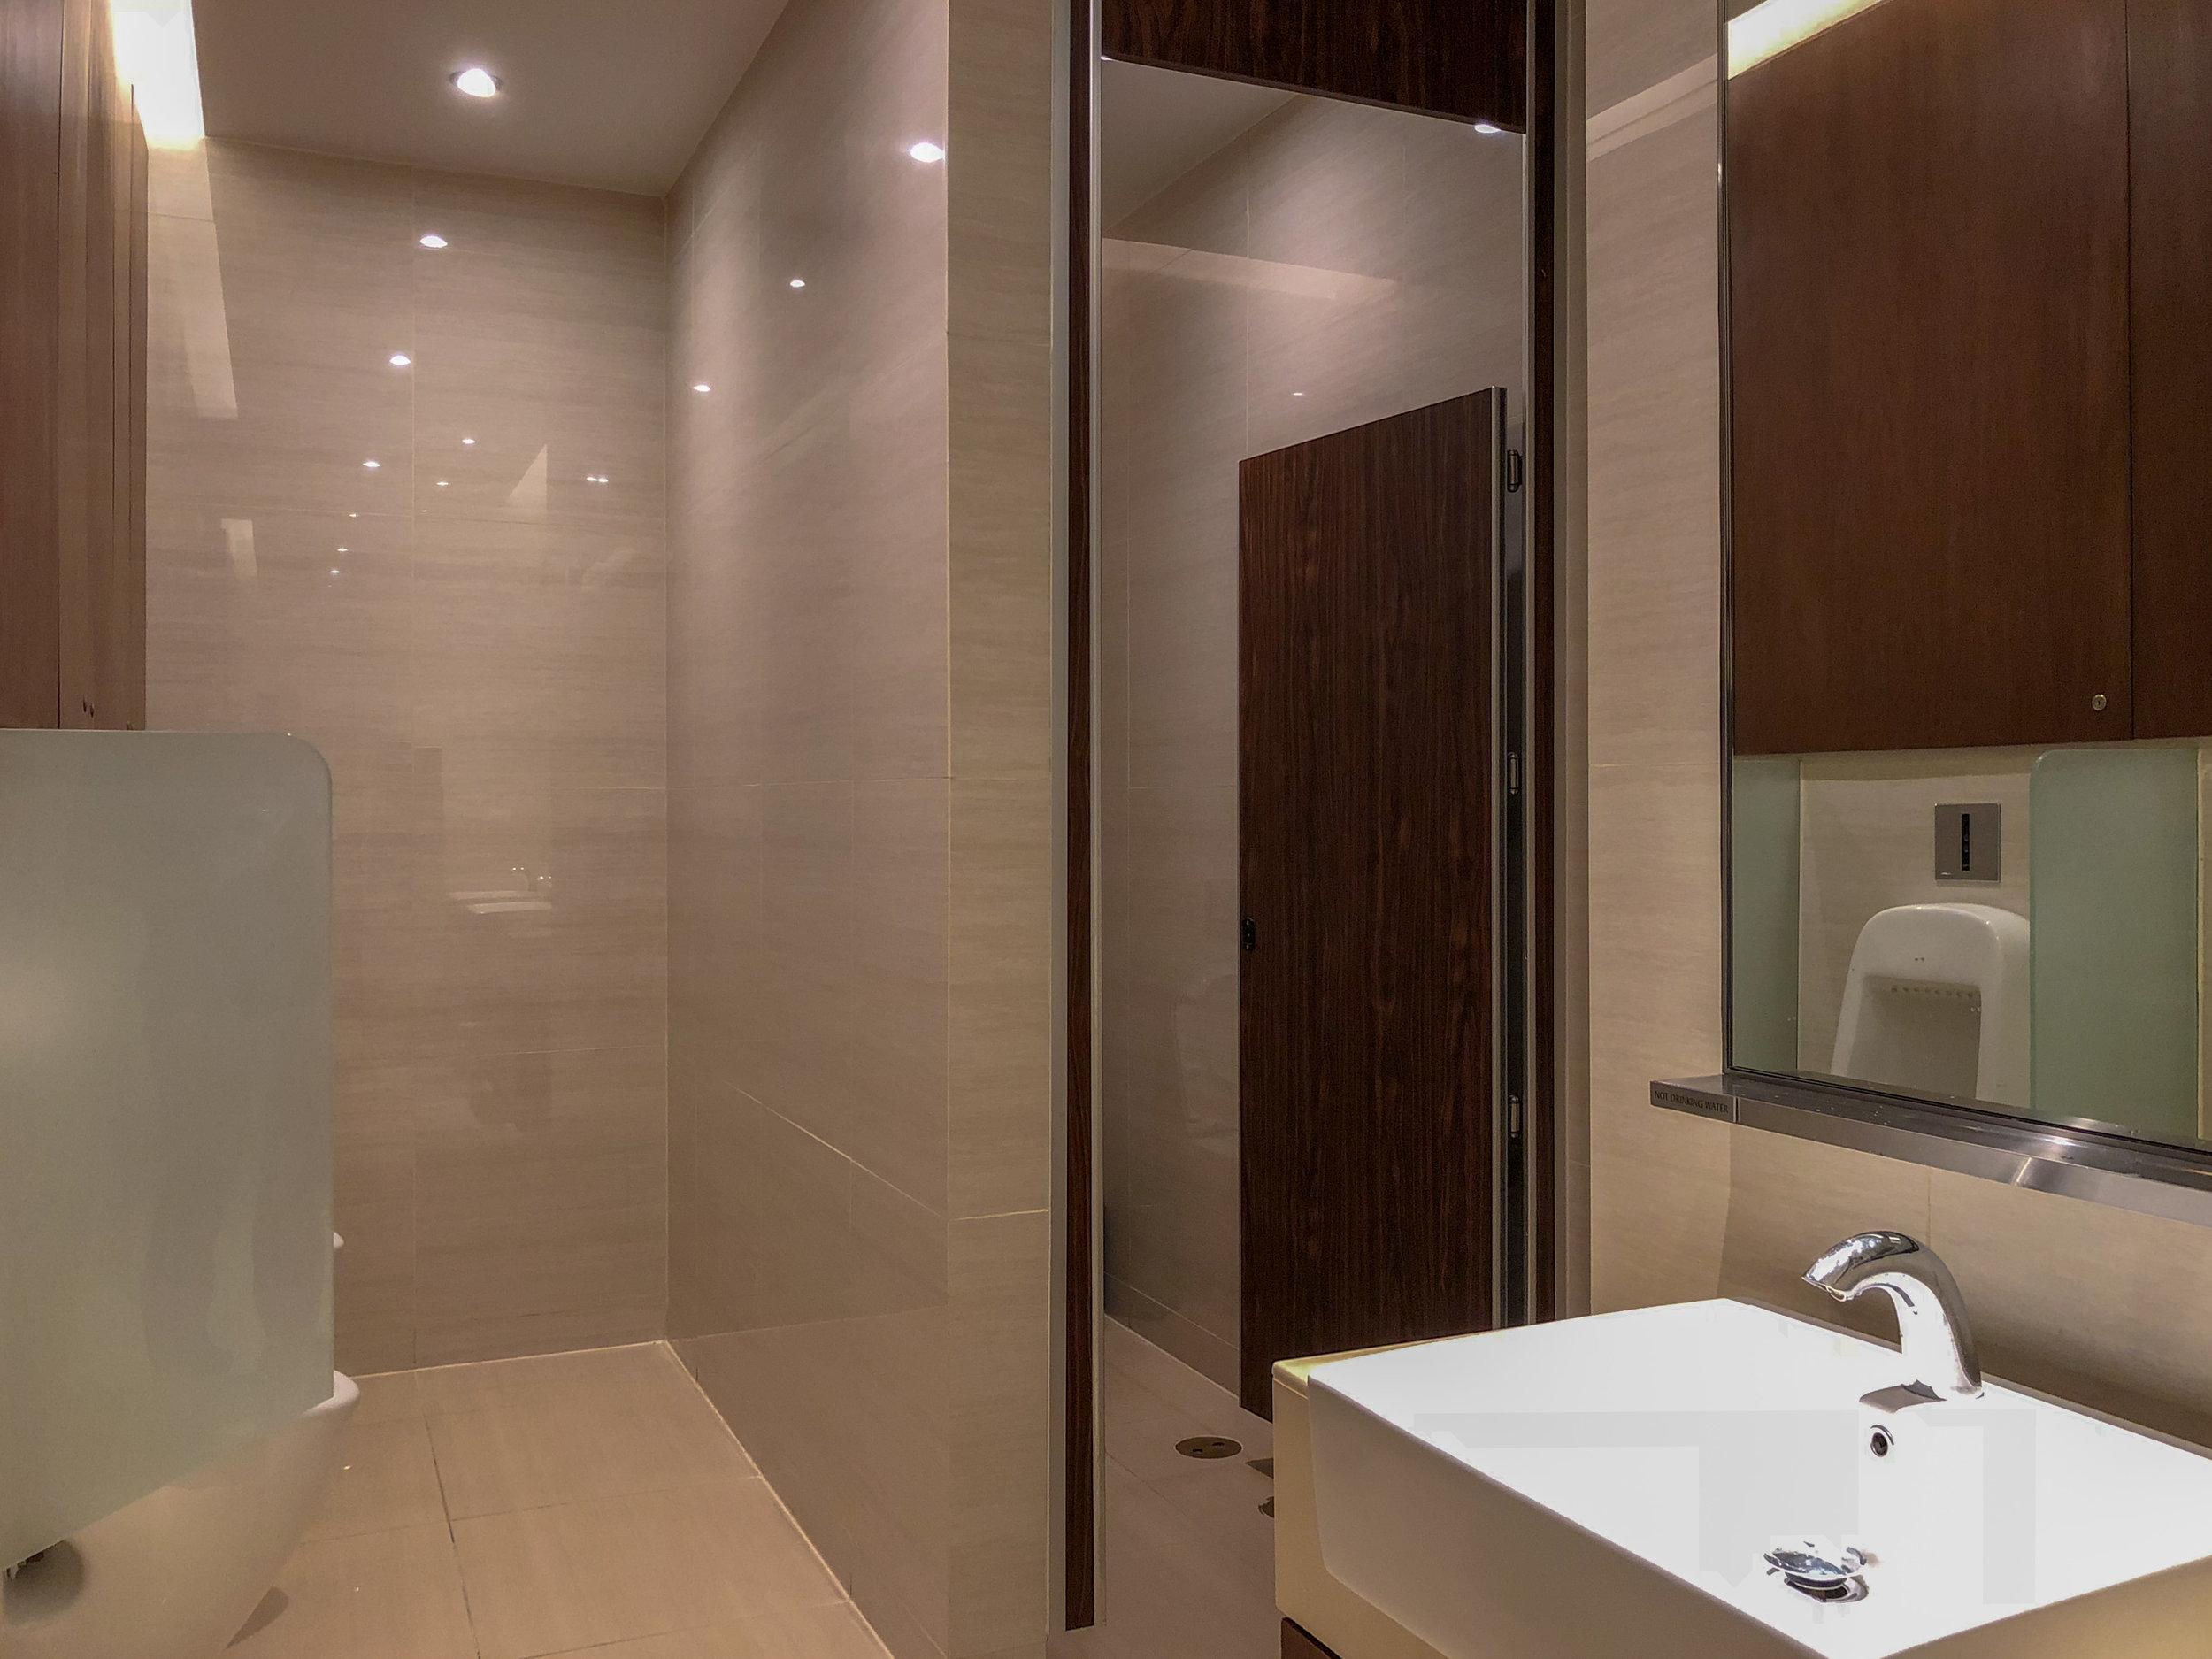 Bathroom  Singapore Airlines SilverKris Lounge - Suvarnabhumi Airport (BKK)